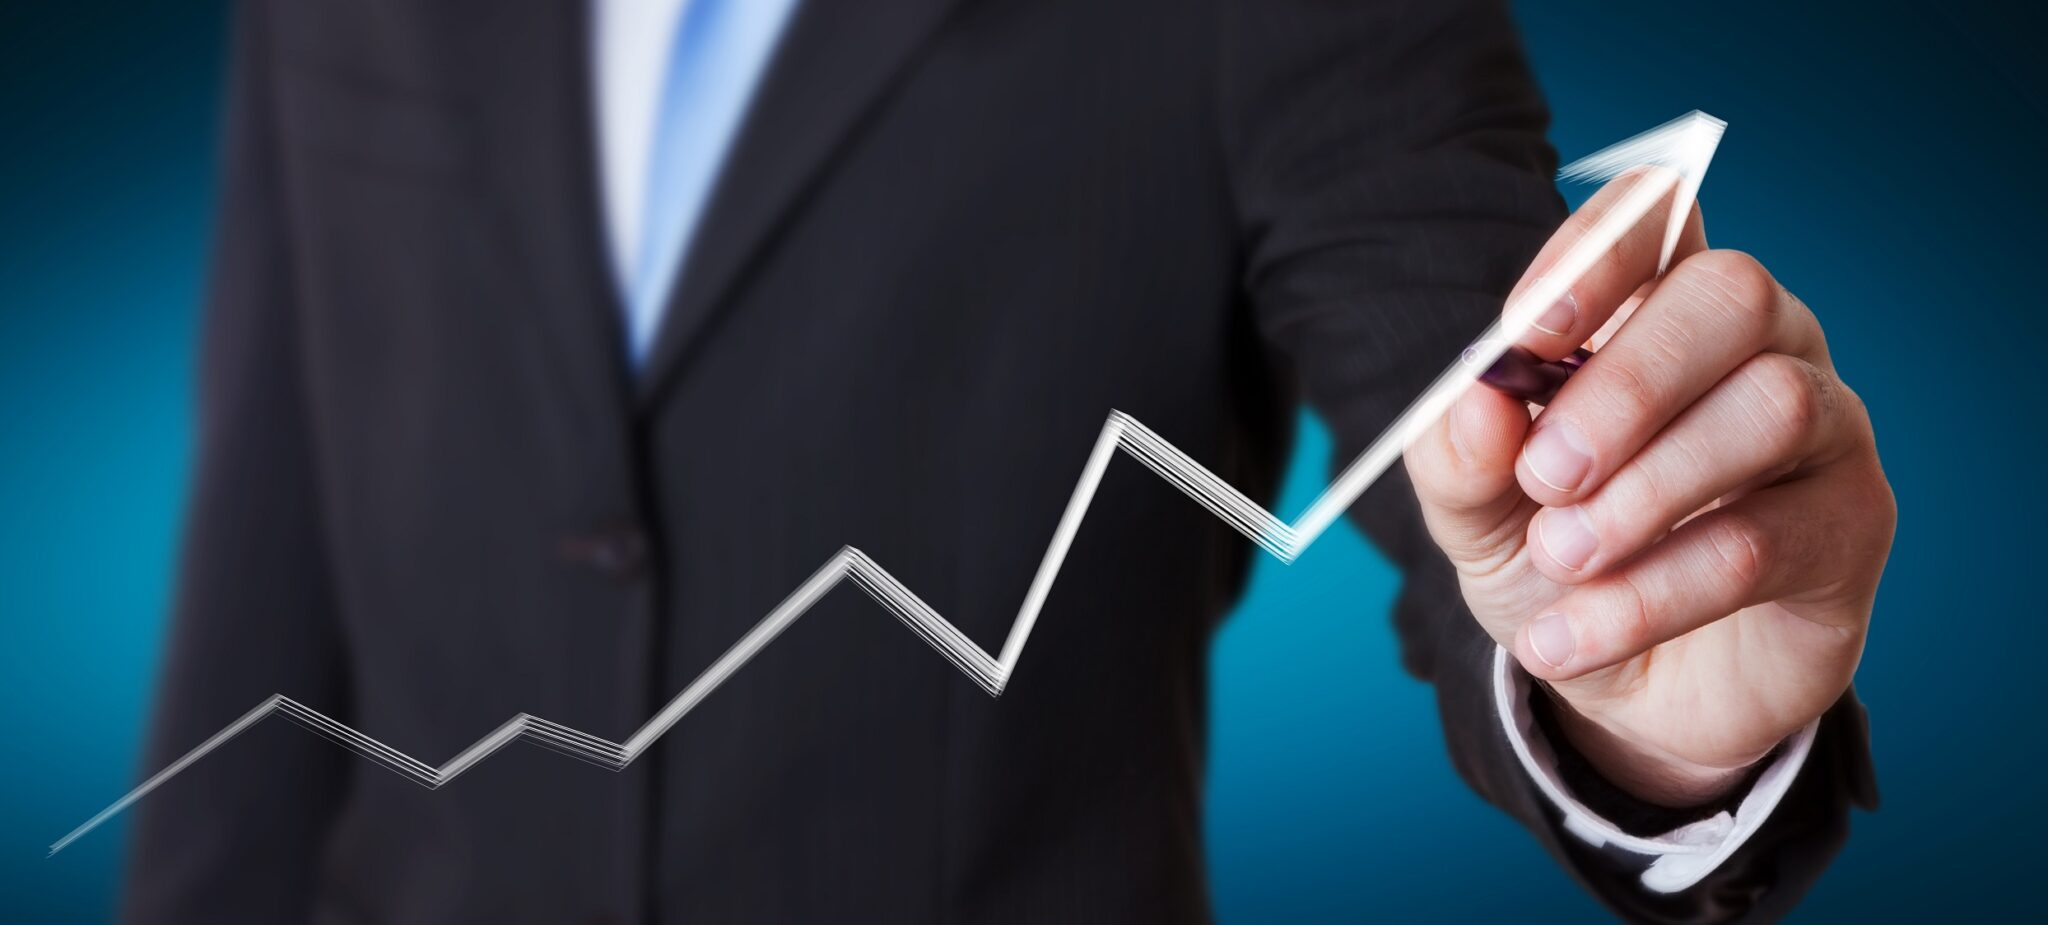 ab wann bekommt man bei aktien dividende